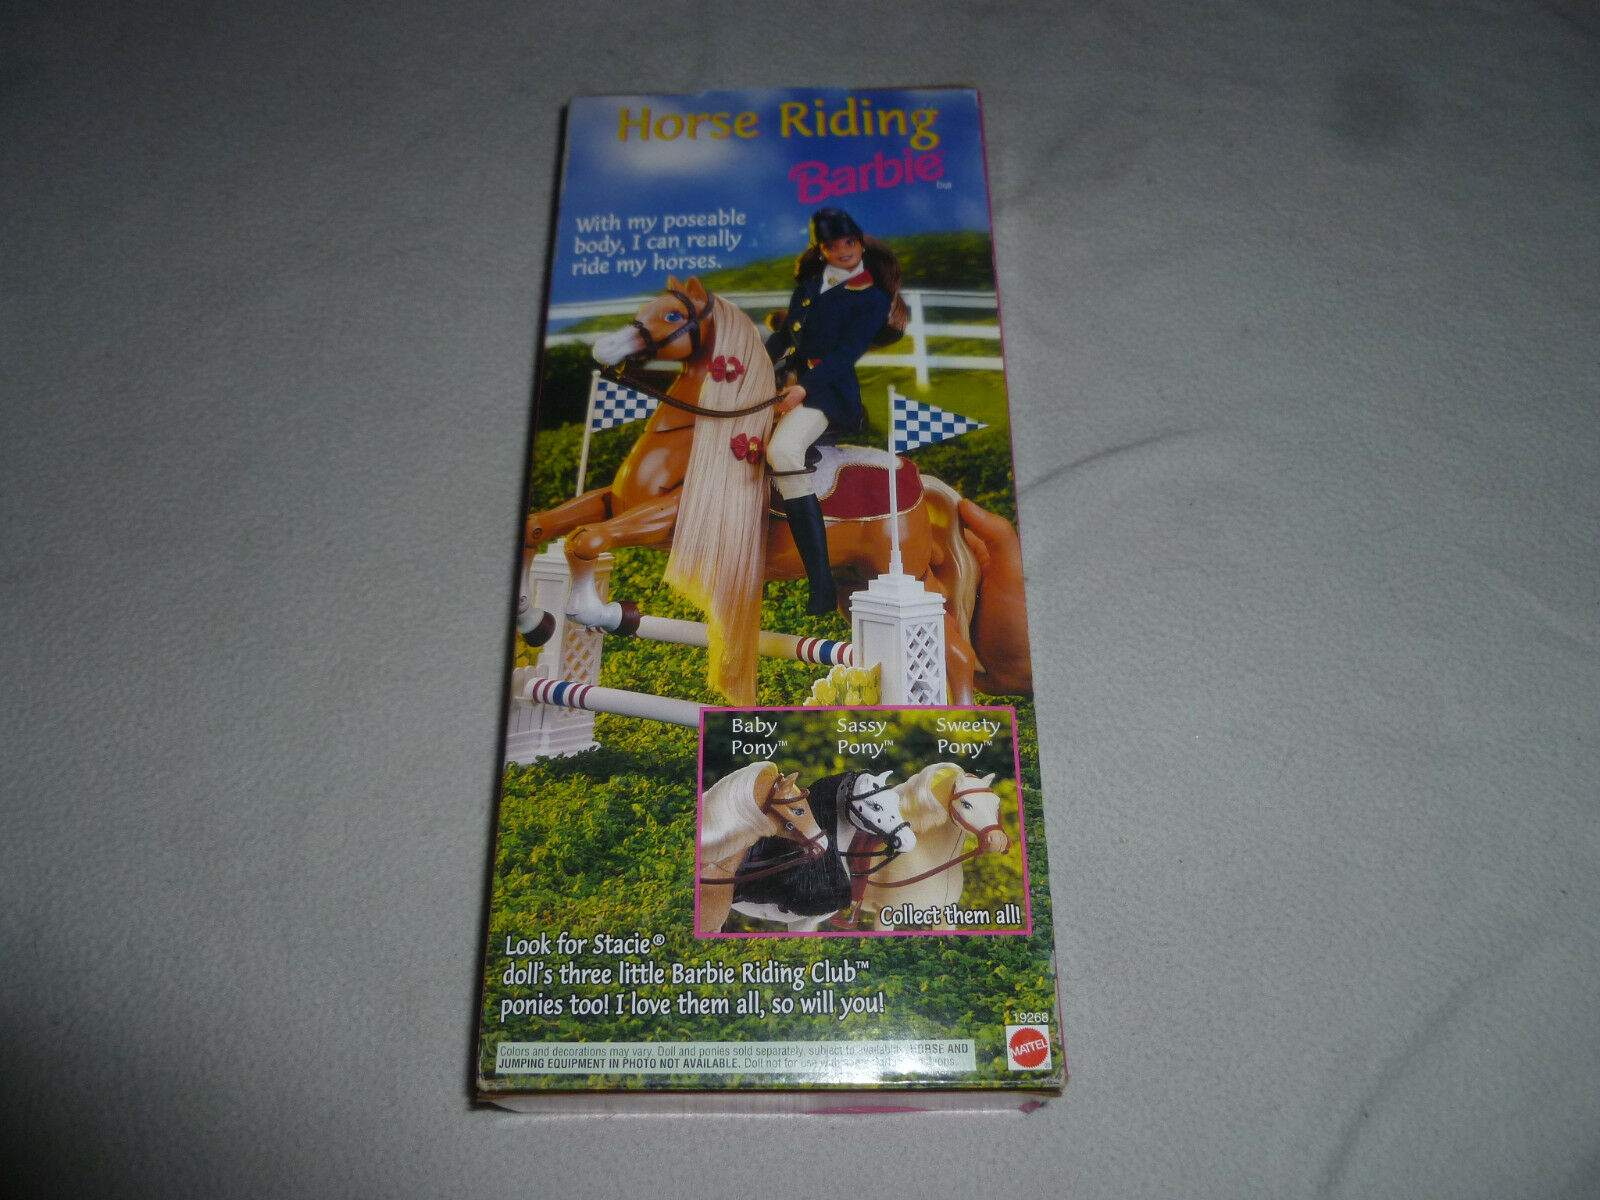 NEW IN BOX HORSE RIDING RIDING RIDING CLUB BARBIE DOLL MATTEL 19268 NIB 1997 POSEABLE BODY fbd401